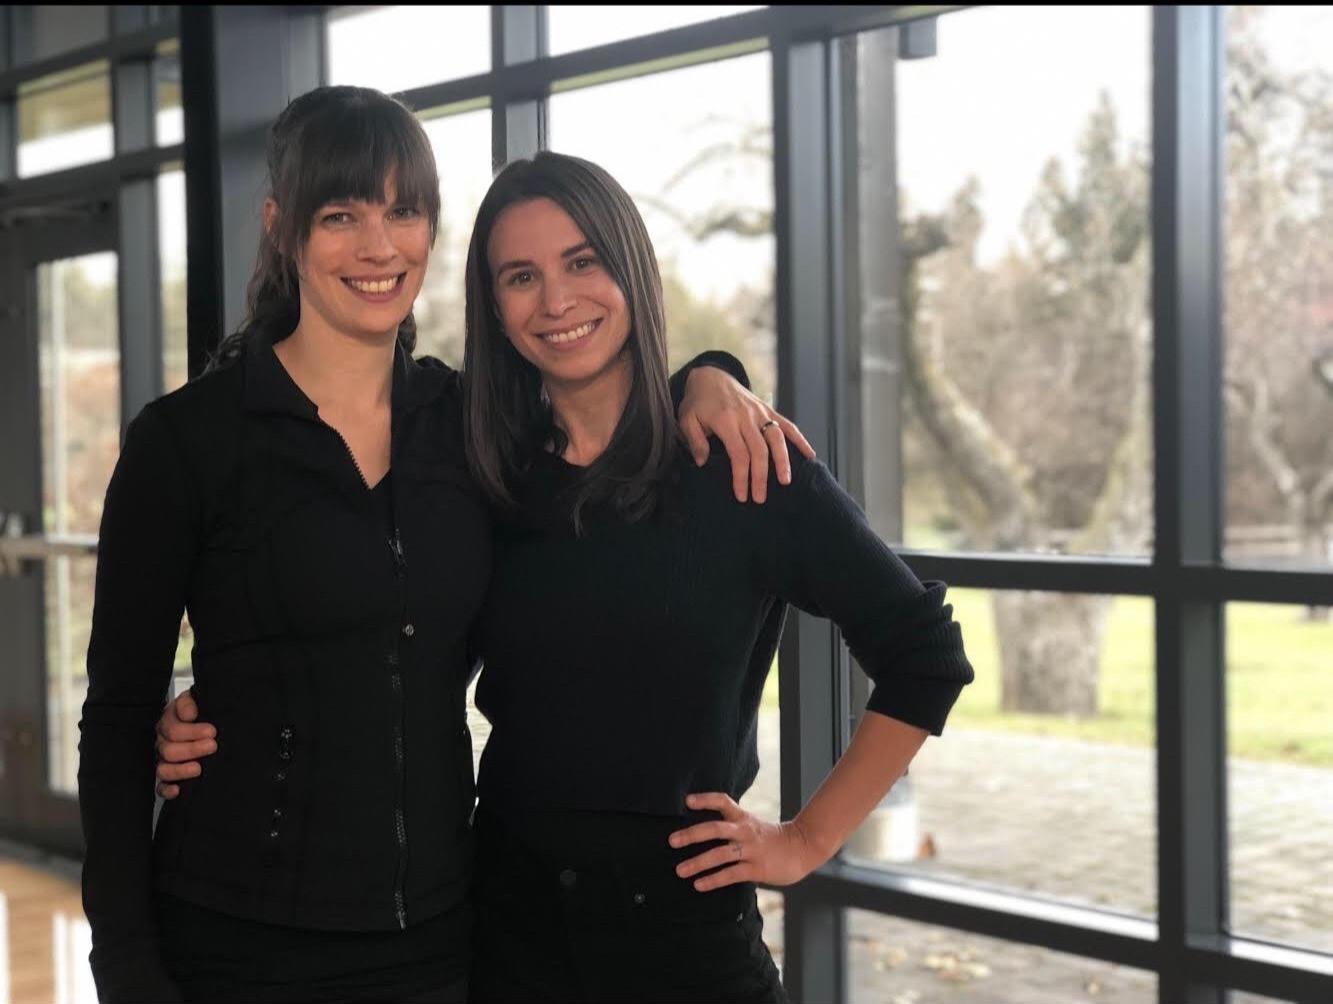 Casey Hudecki and Lindsay Somers - Photo by Alice Hopton CBC